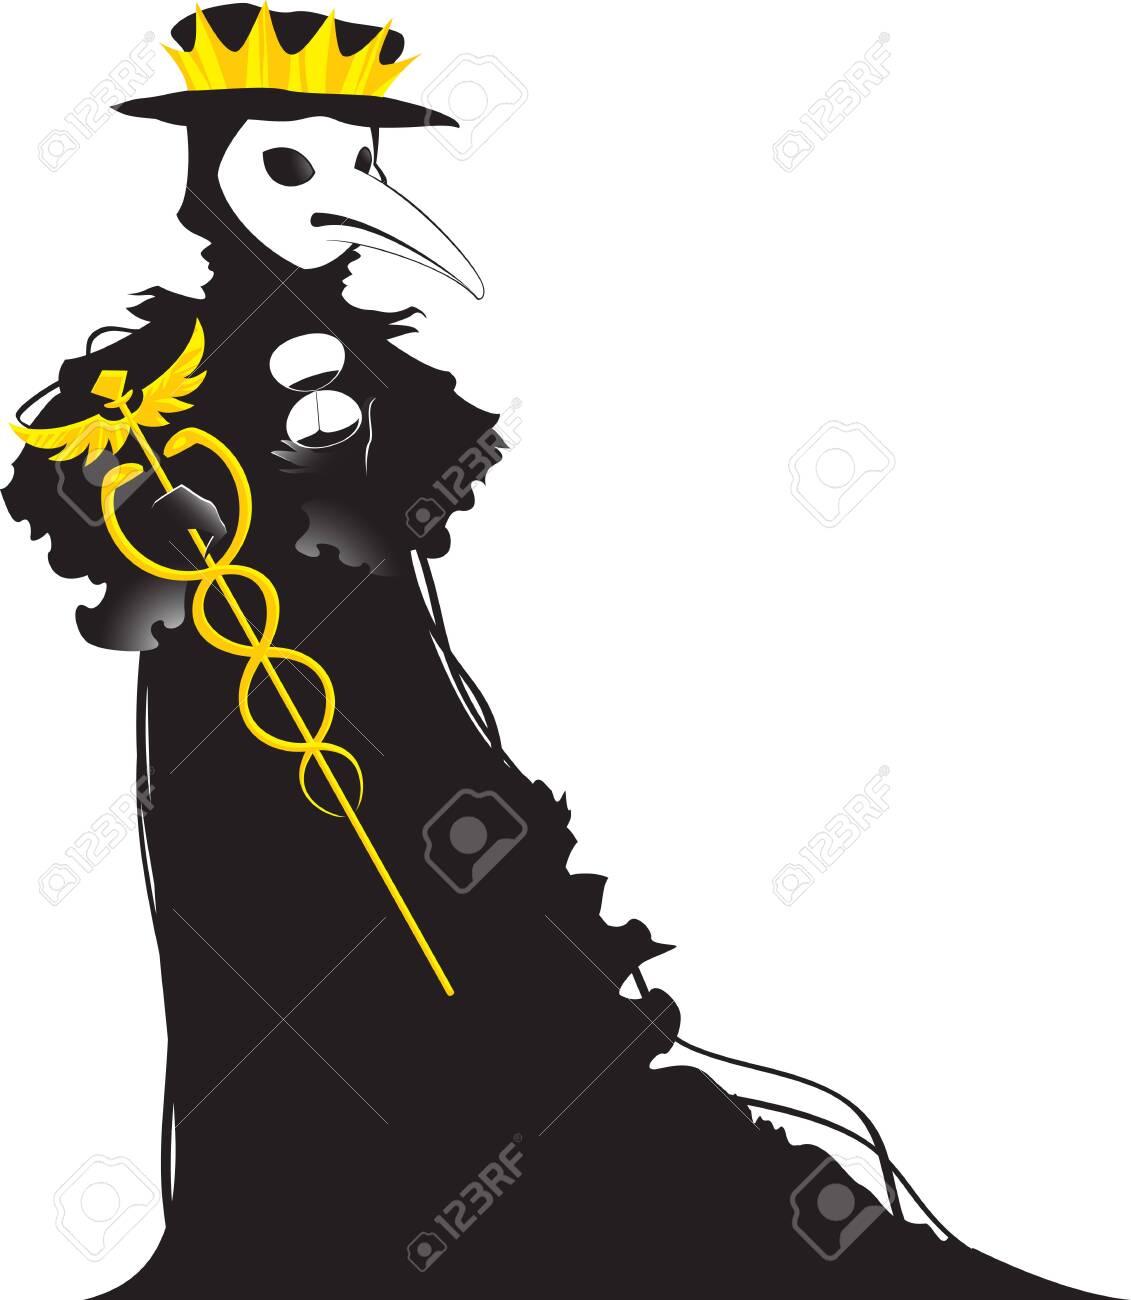 Coronavirus stylized as a black Venetian plague doctor. - 142201976